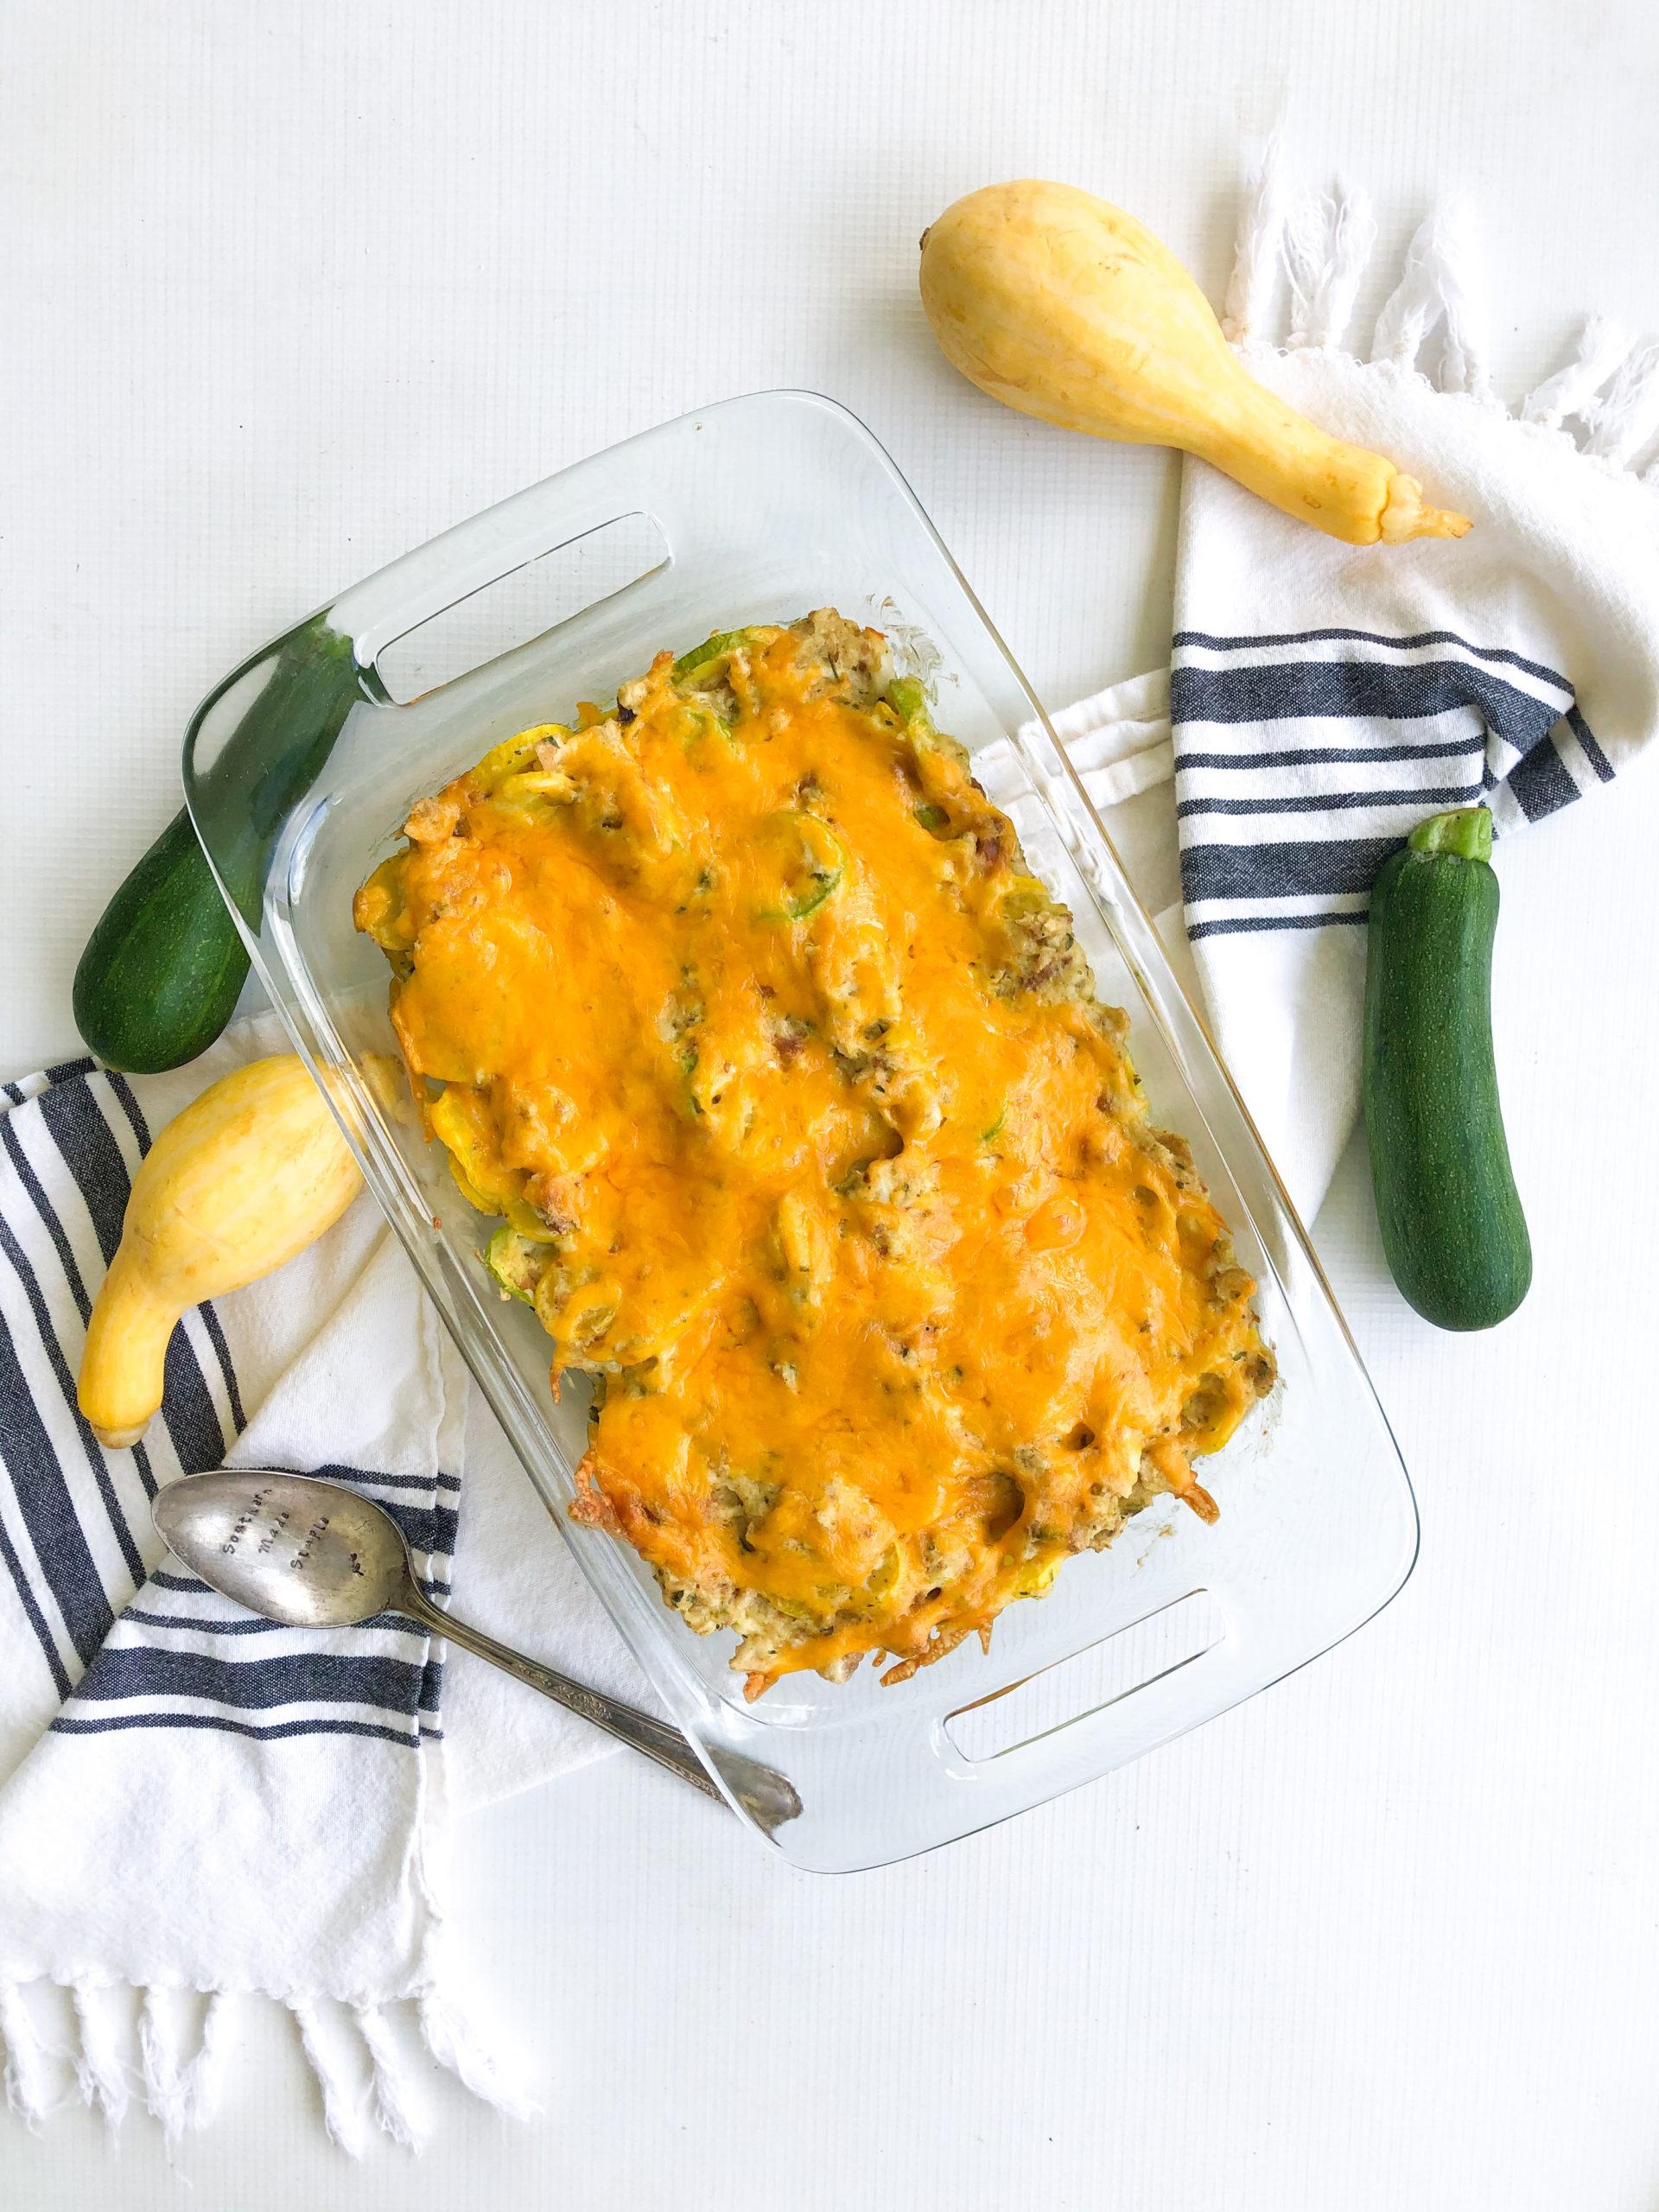 Squash and Zucchini Stuffing Casserole